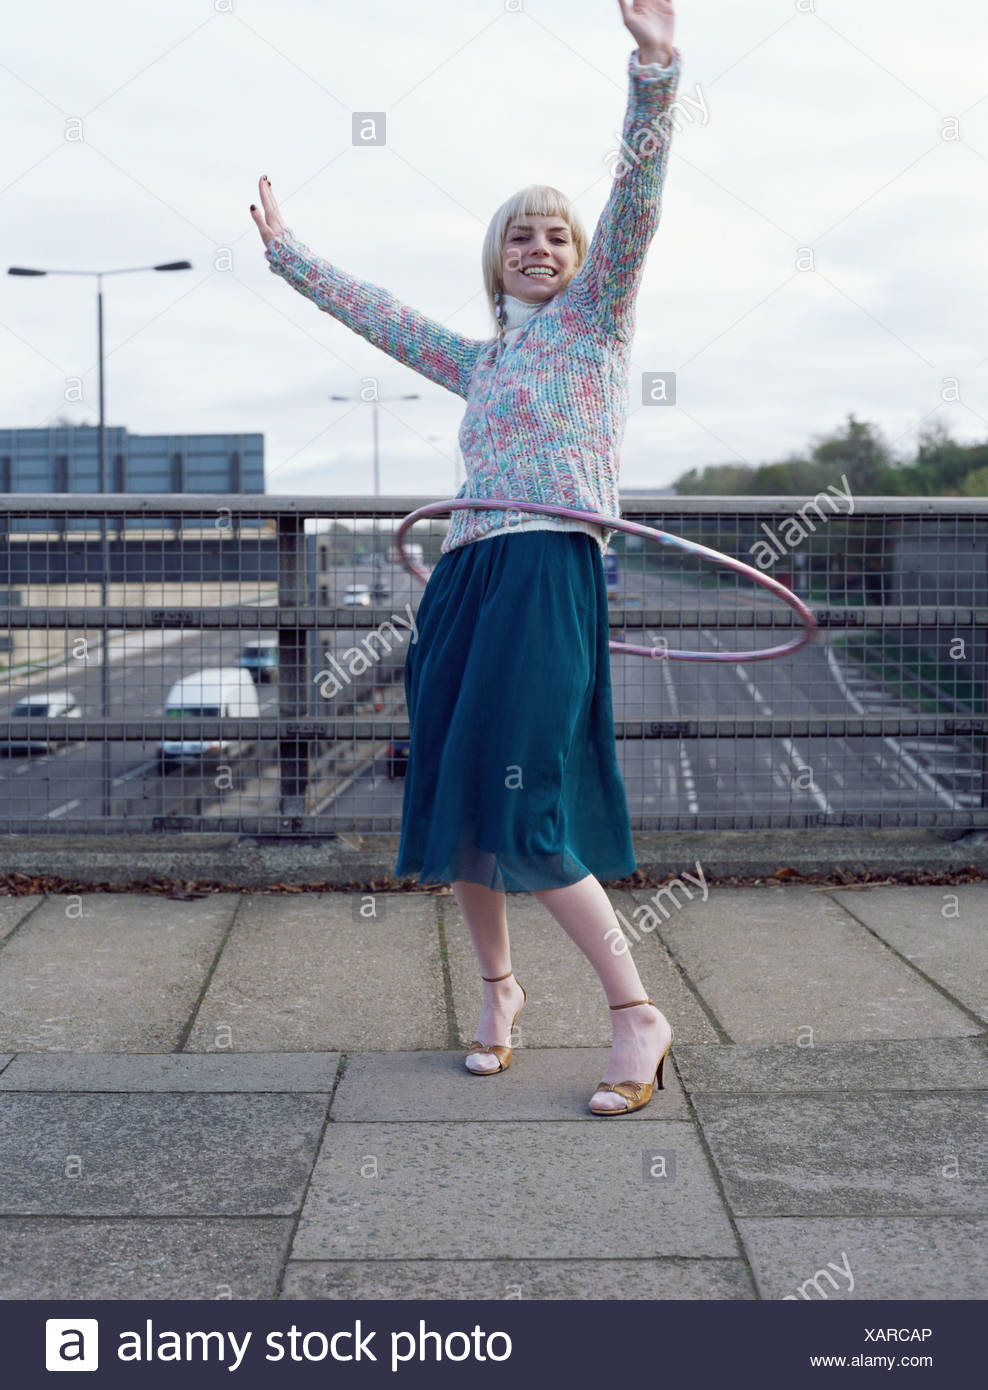 Woman playing with hula hoop on motorway bridge - Stock Image